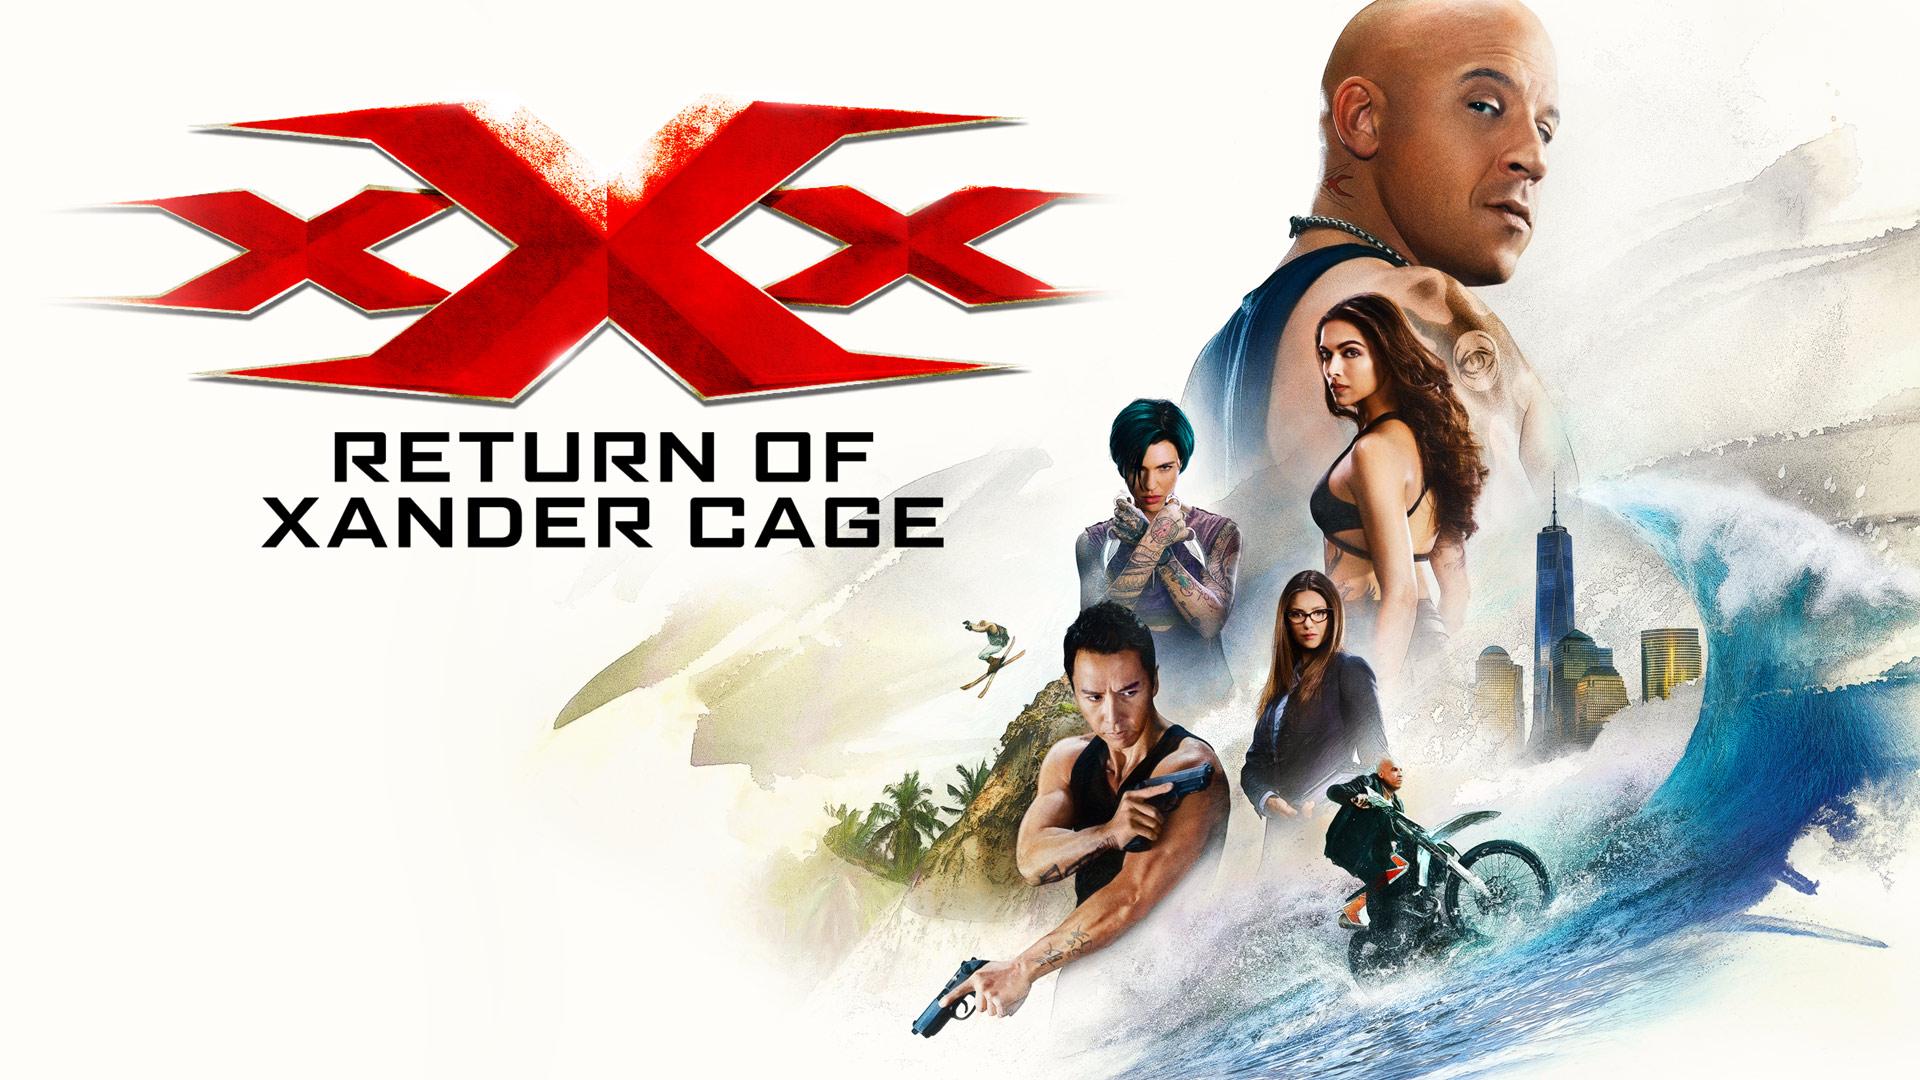 xXx: Return of Xander Cage (4K UHD)